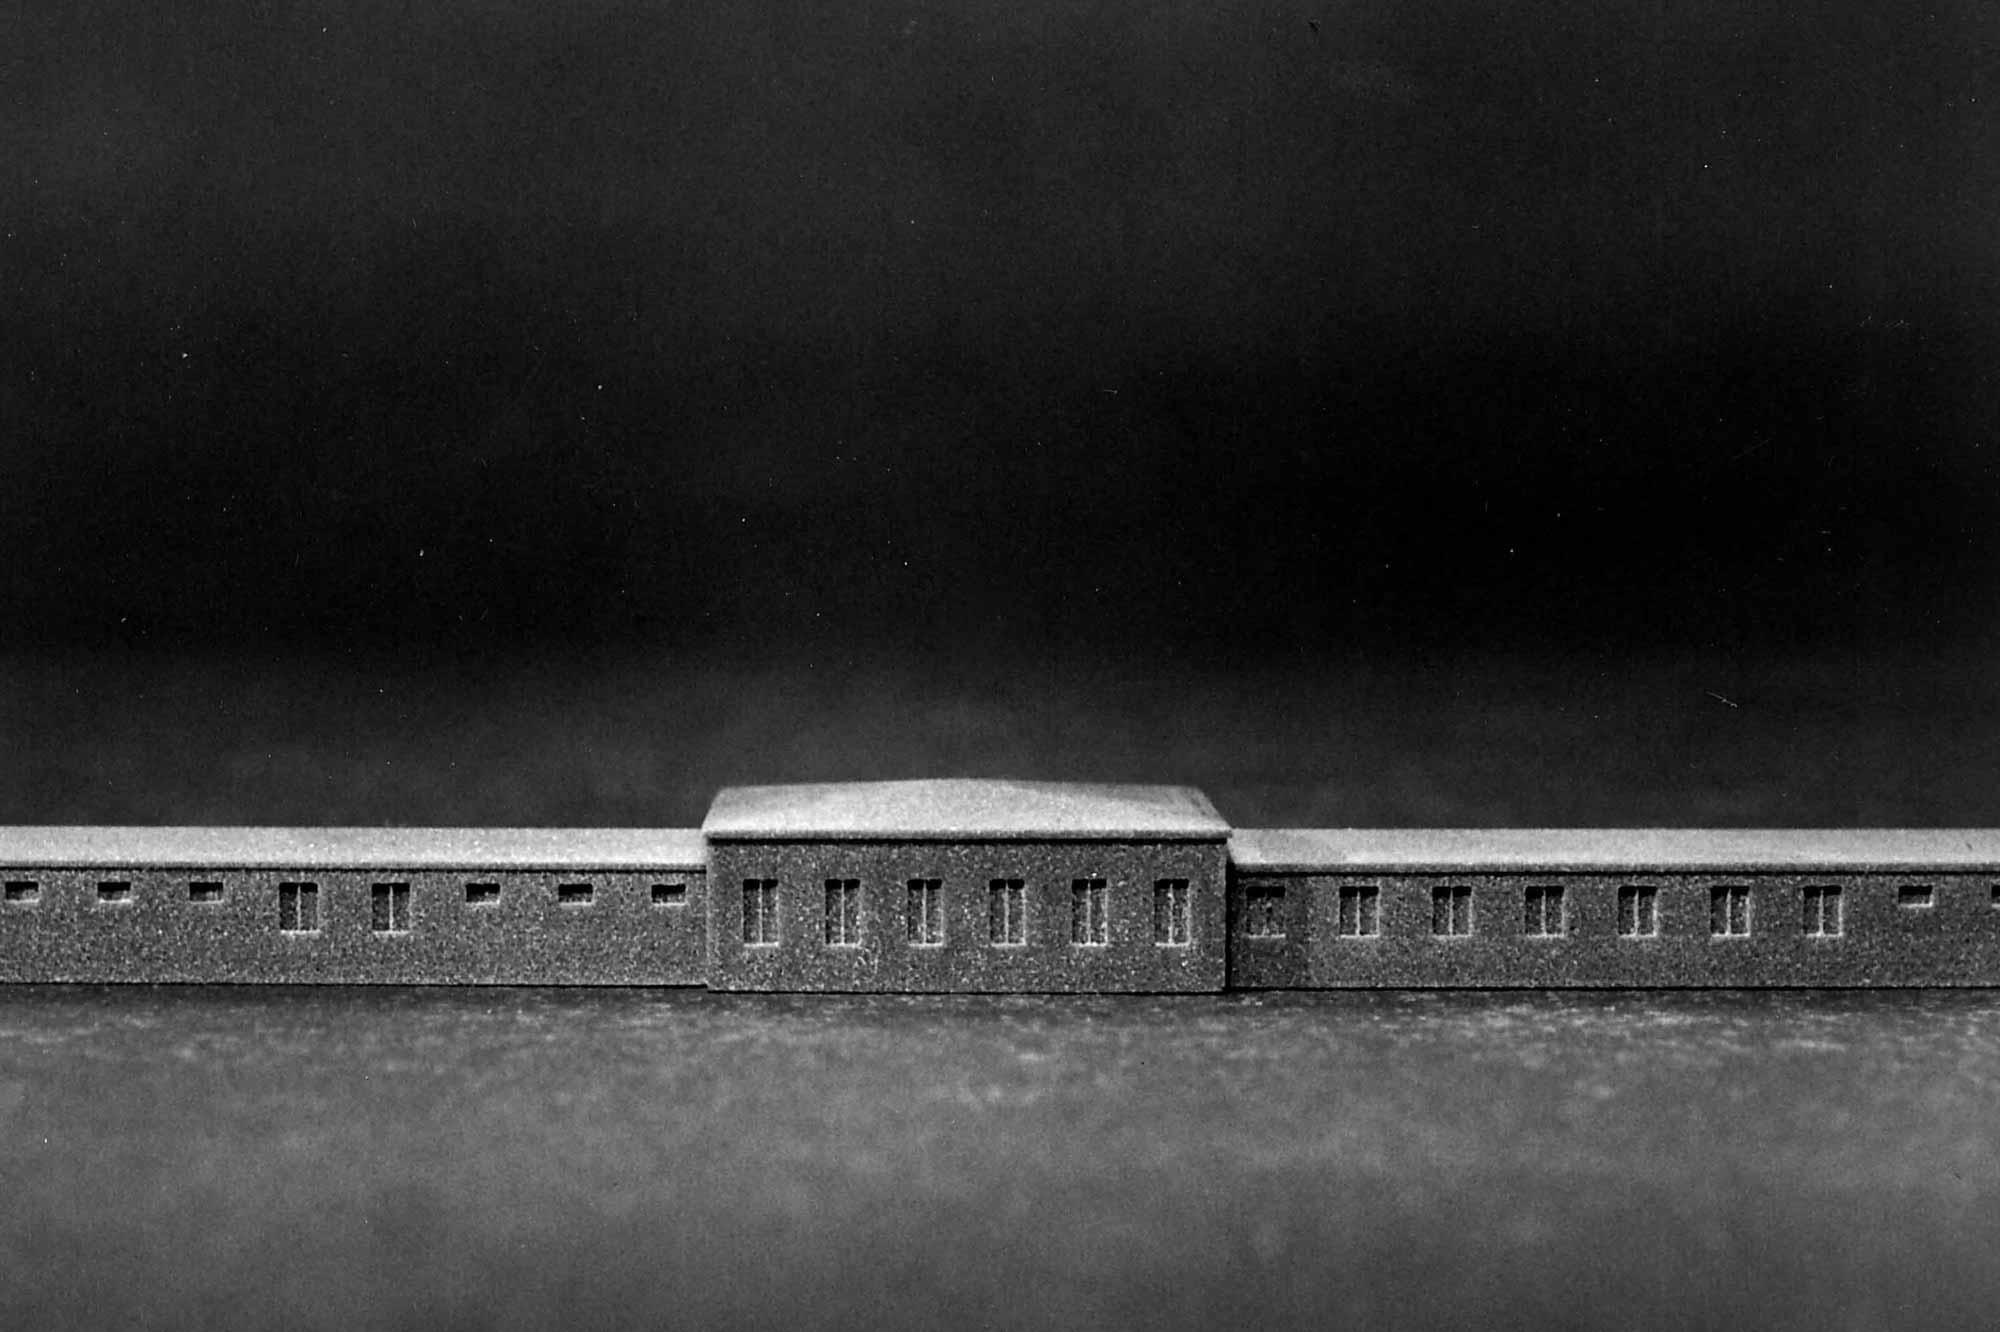 Verhör im Licht, Fotodokumentation Modell, Bunker KZ Dachau